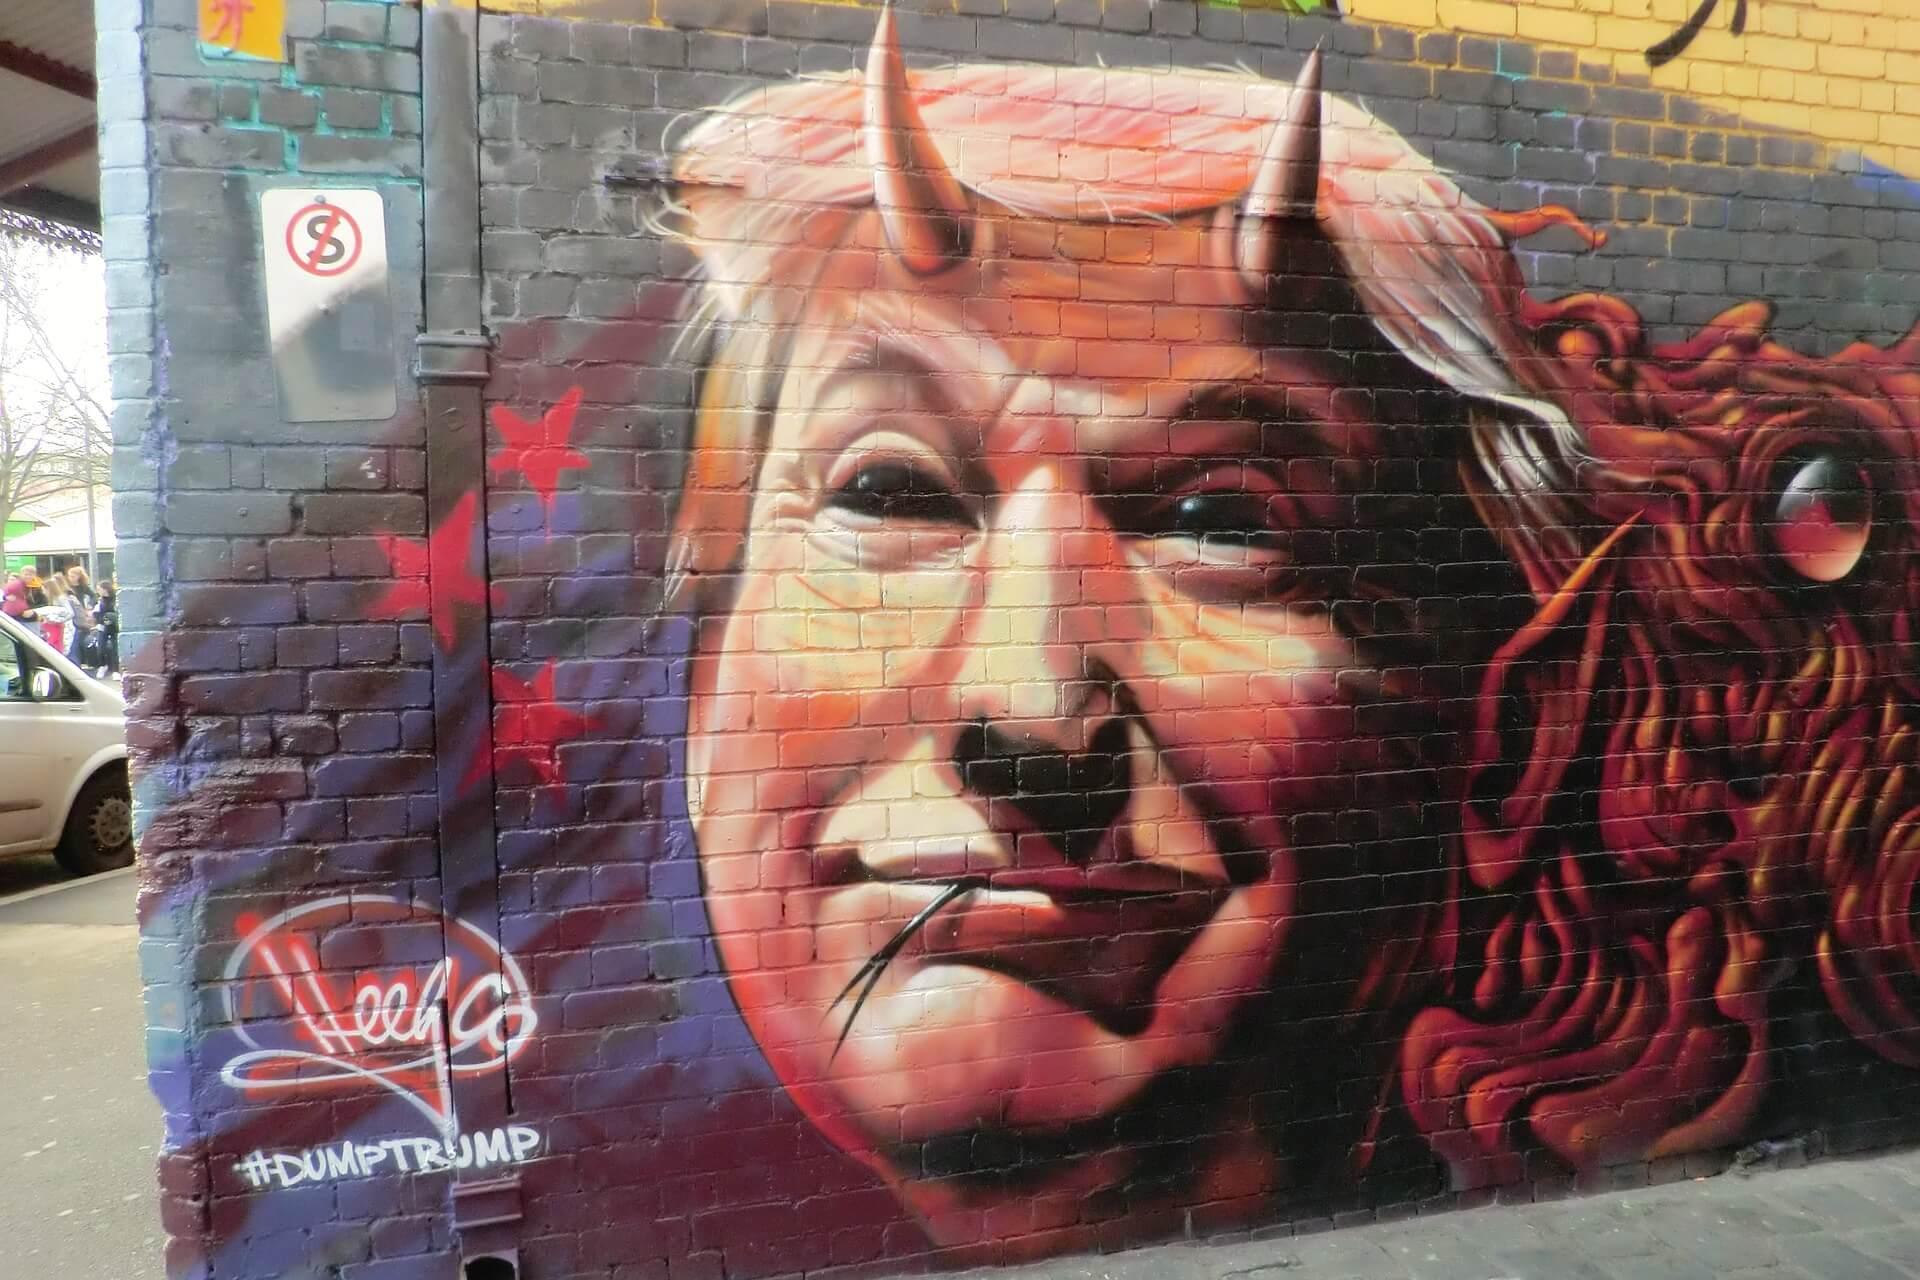 A look at Trump's failures